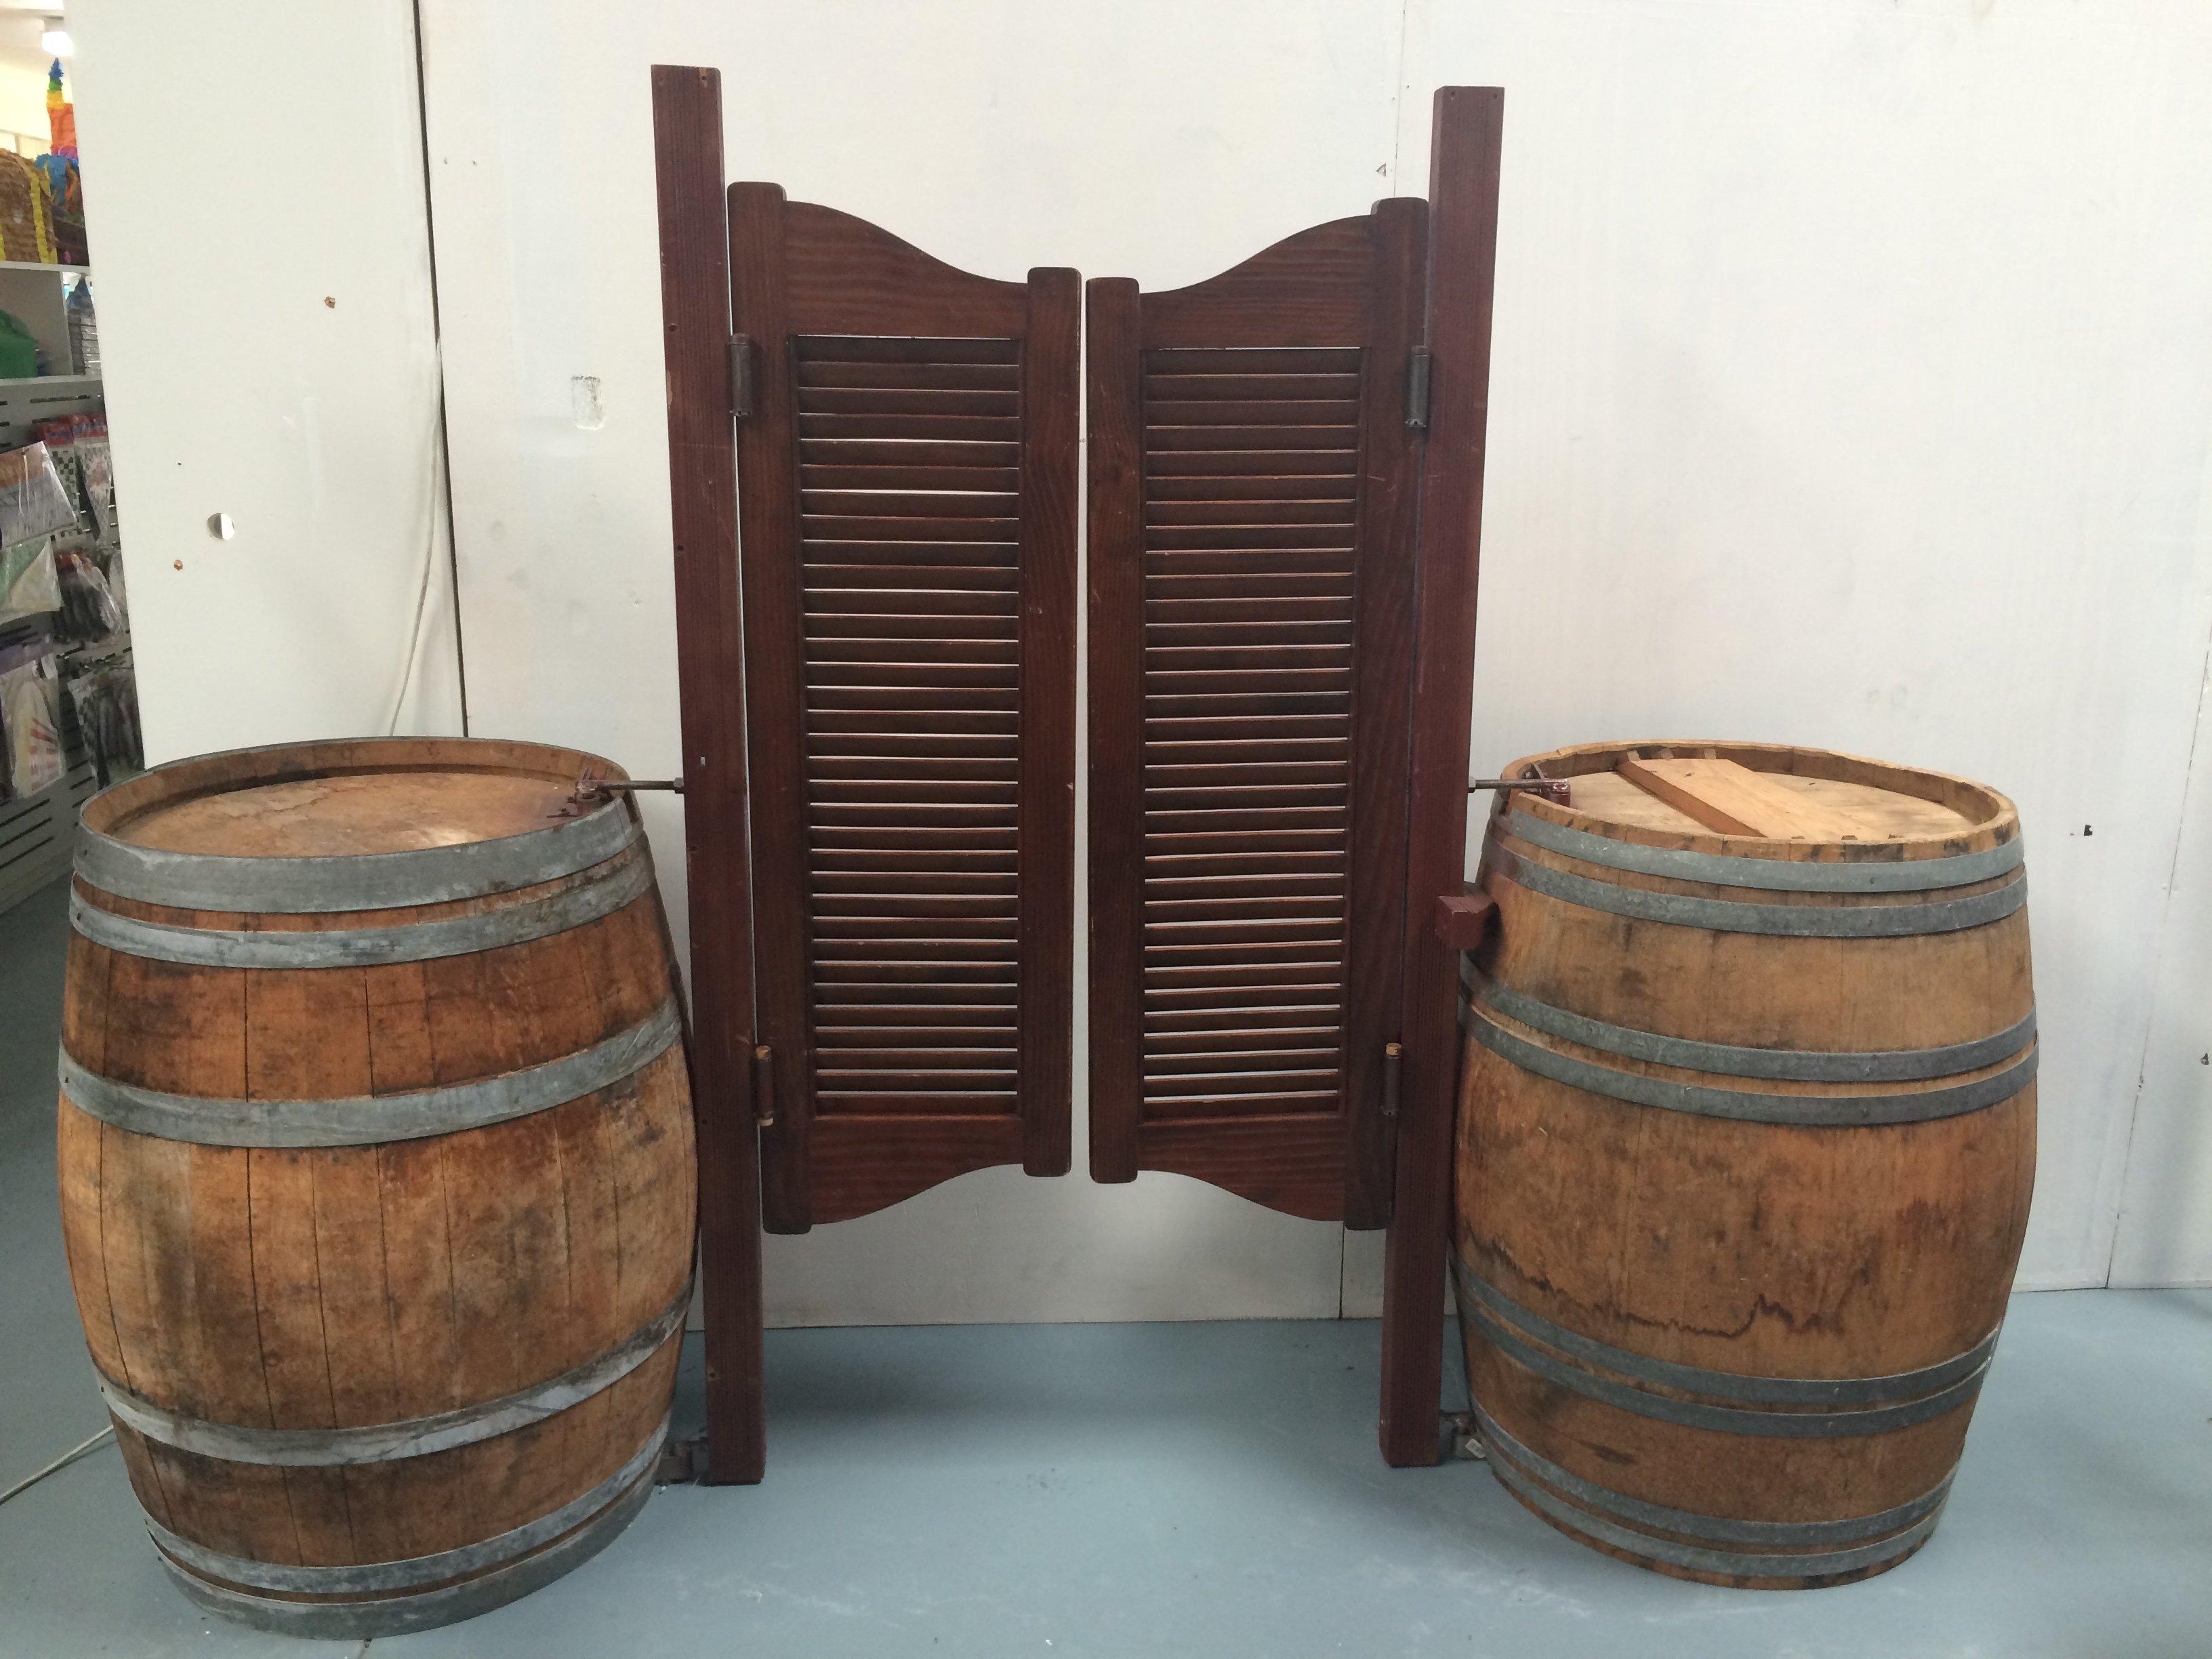 Western Barrels And Swing Doors Total width 2.2m  height 1.7m depth 63cm $150 incl gst